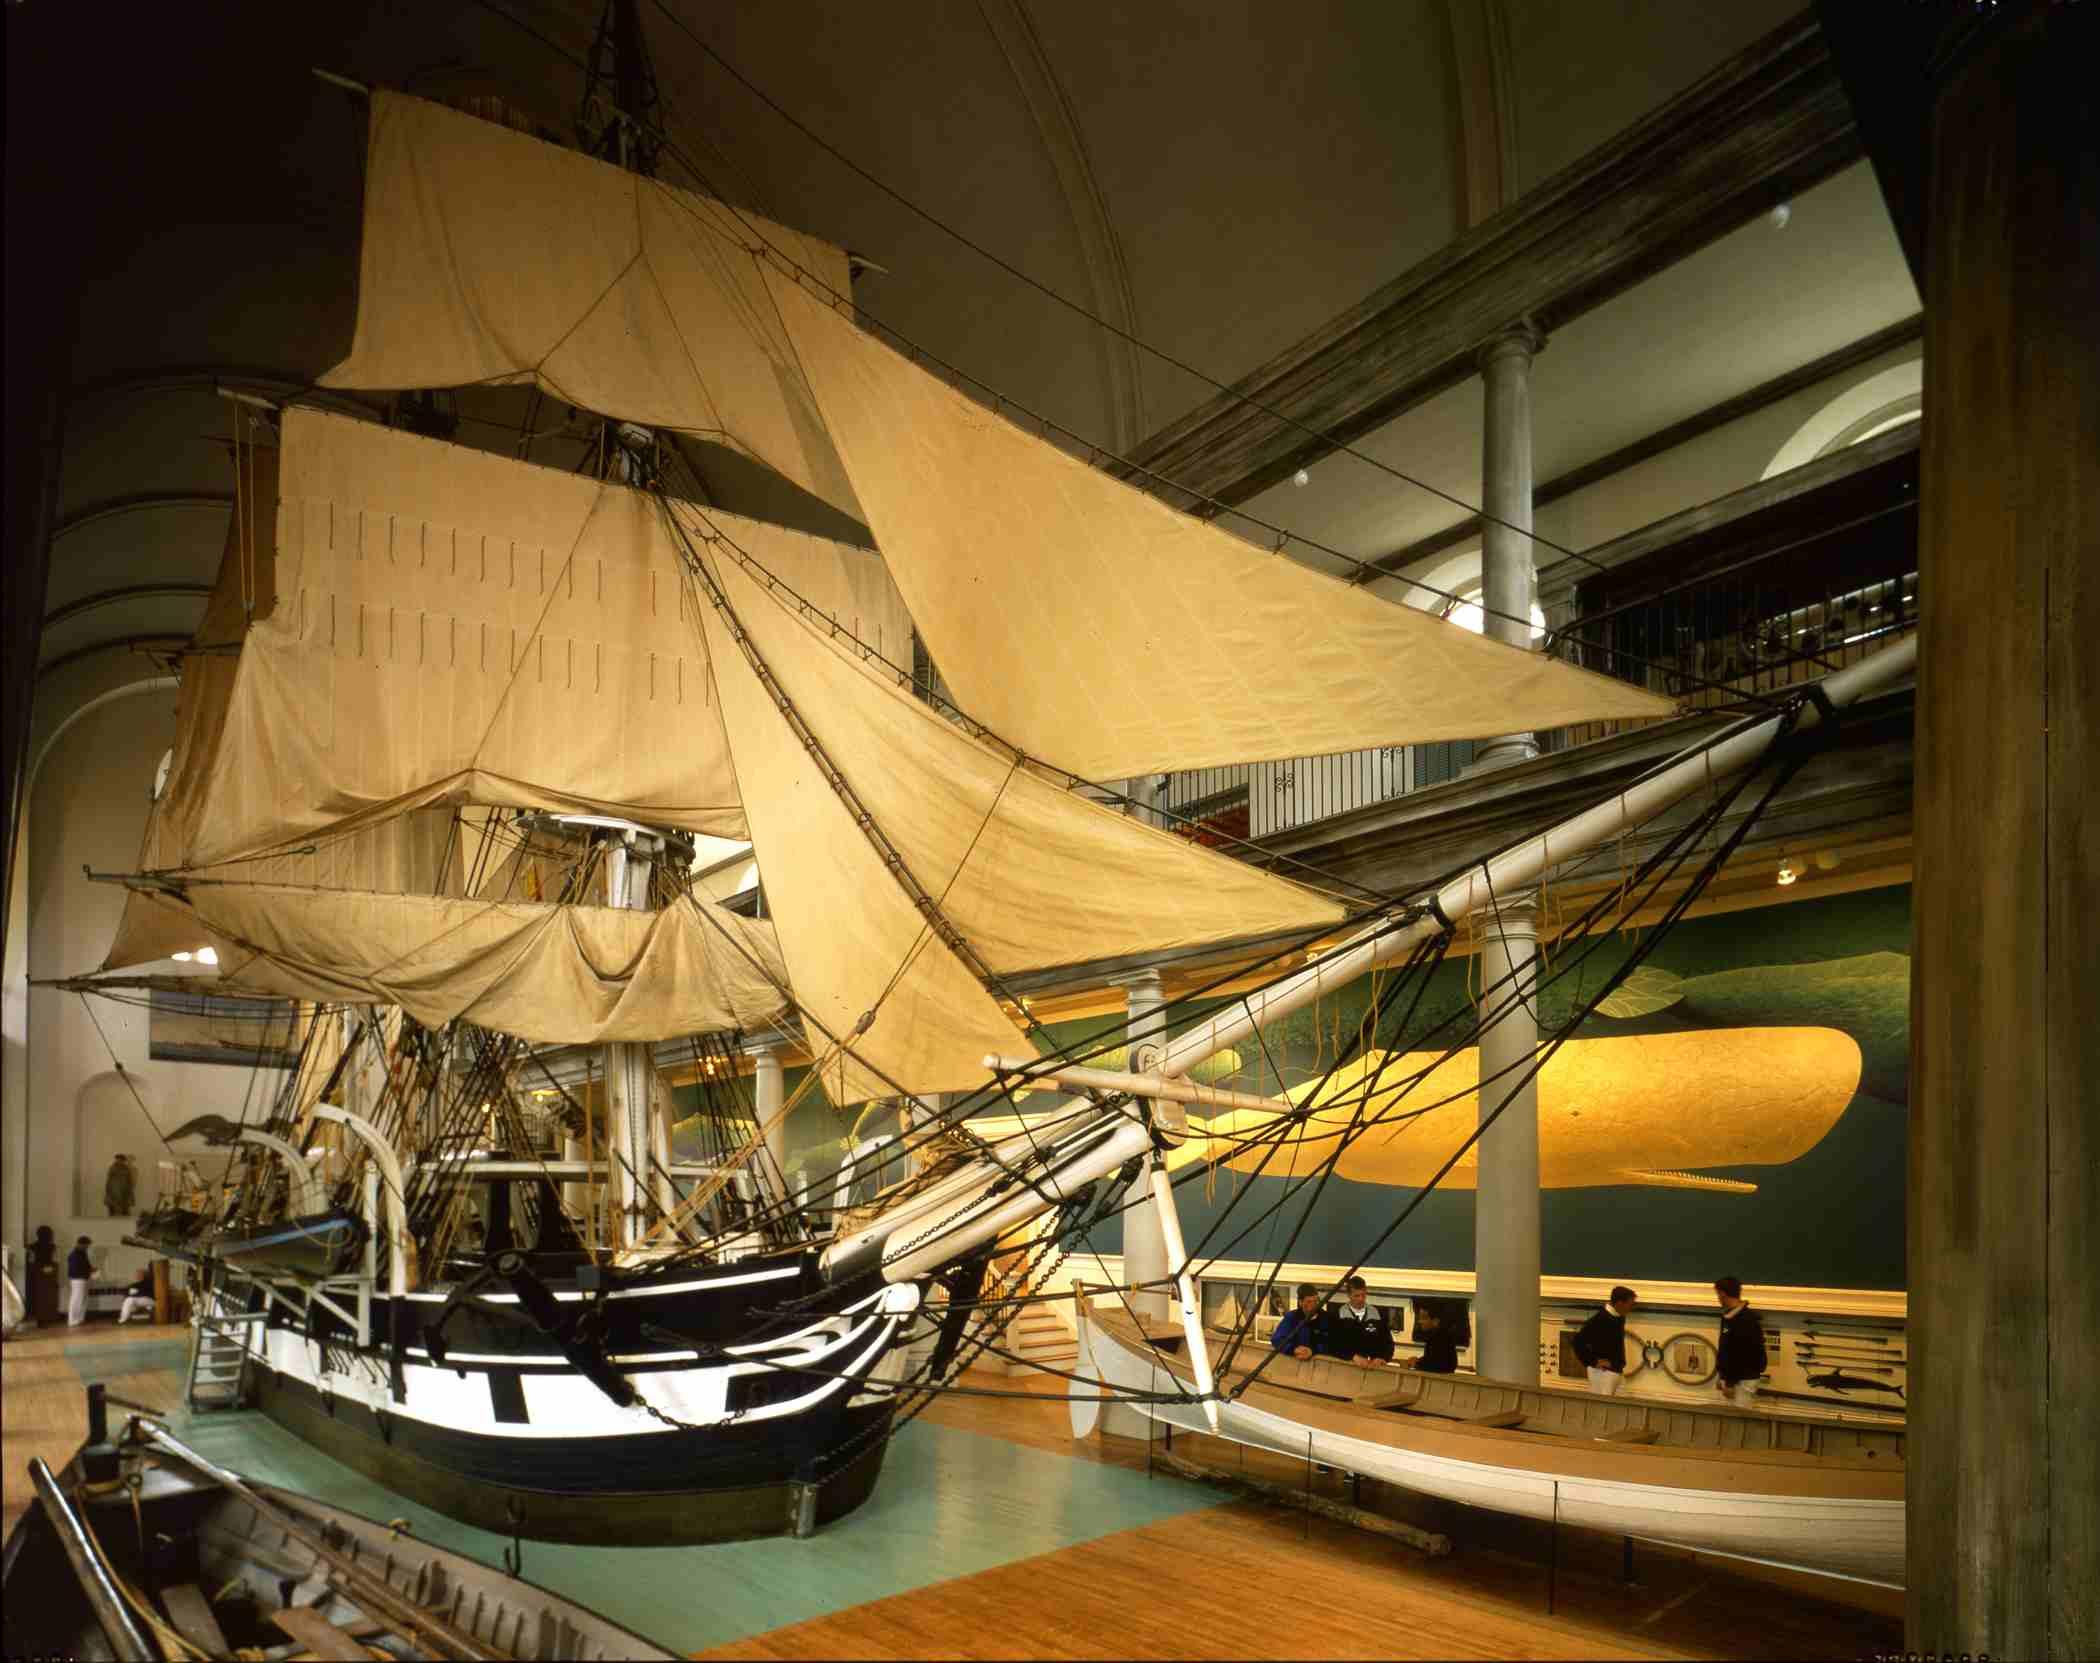 Lagoda Whaling Ship